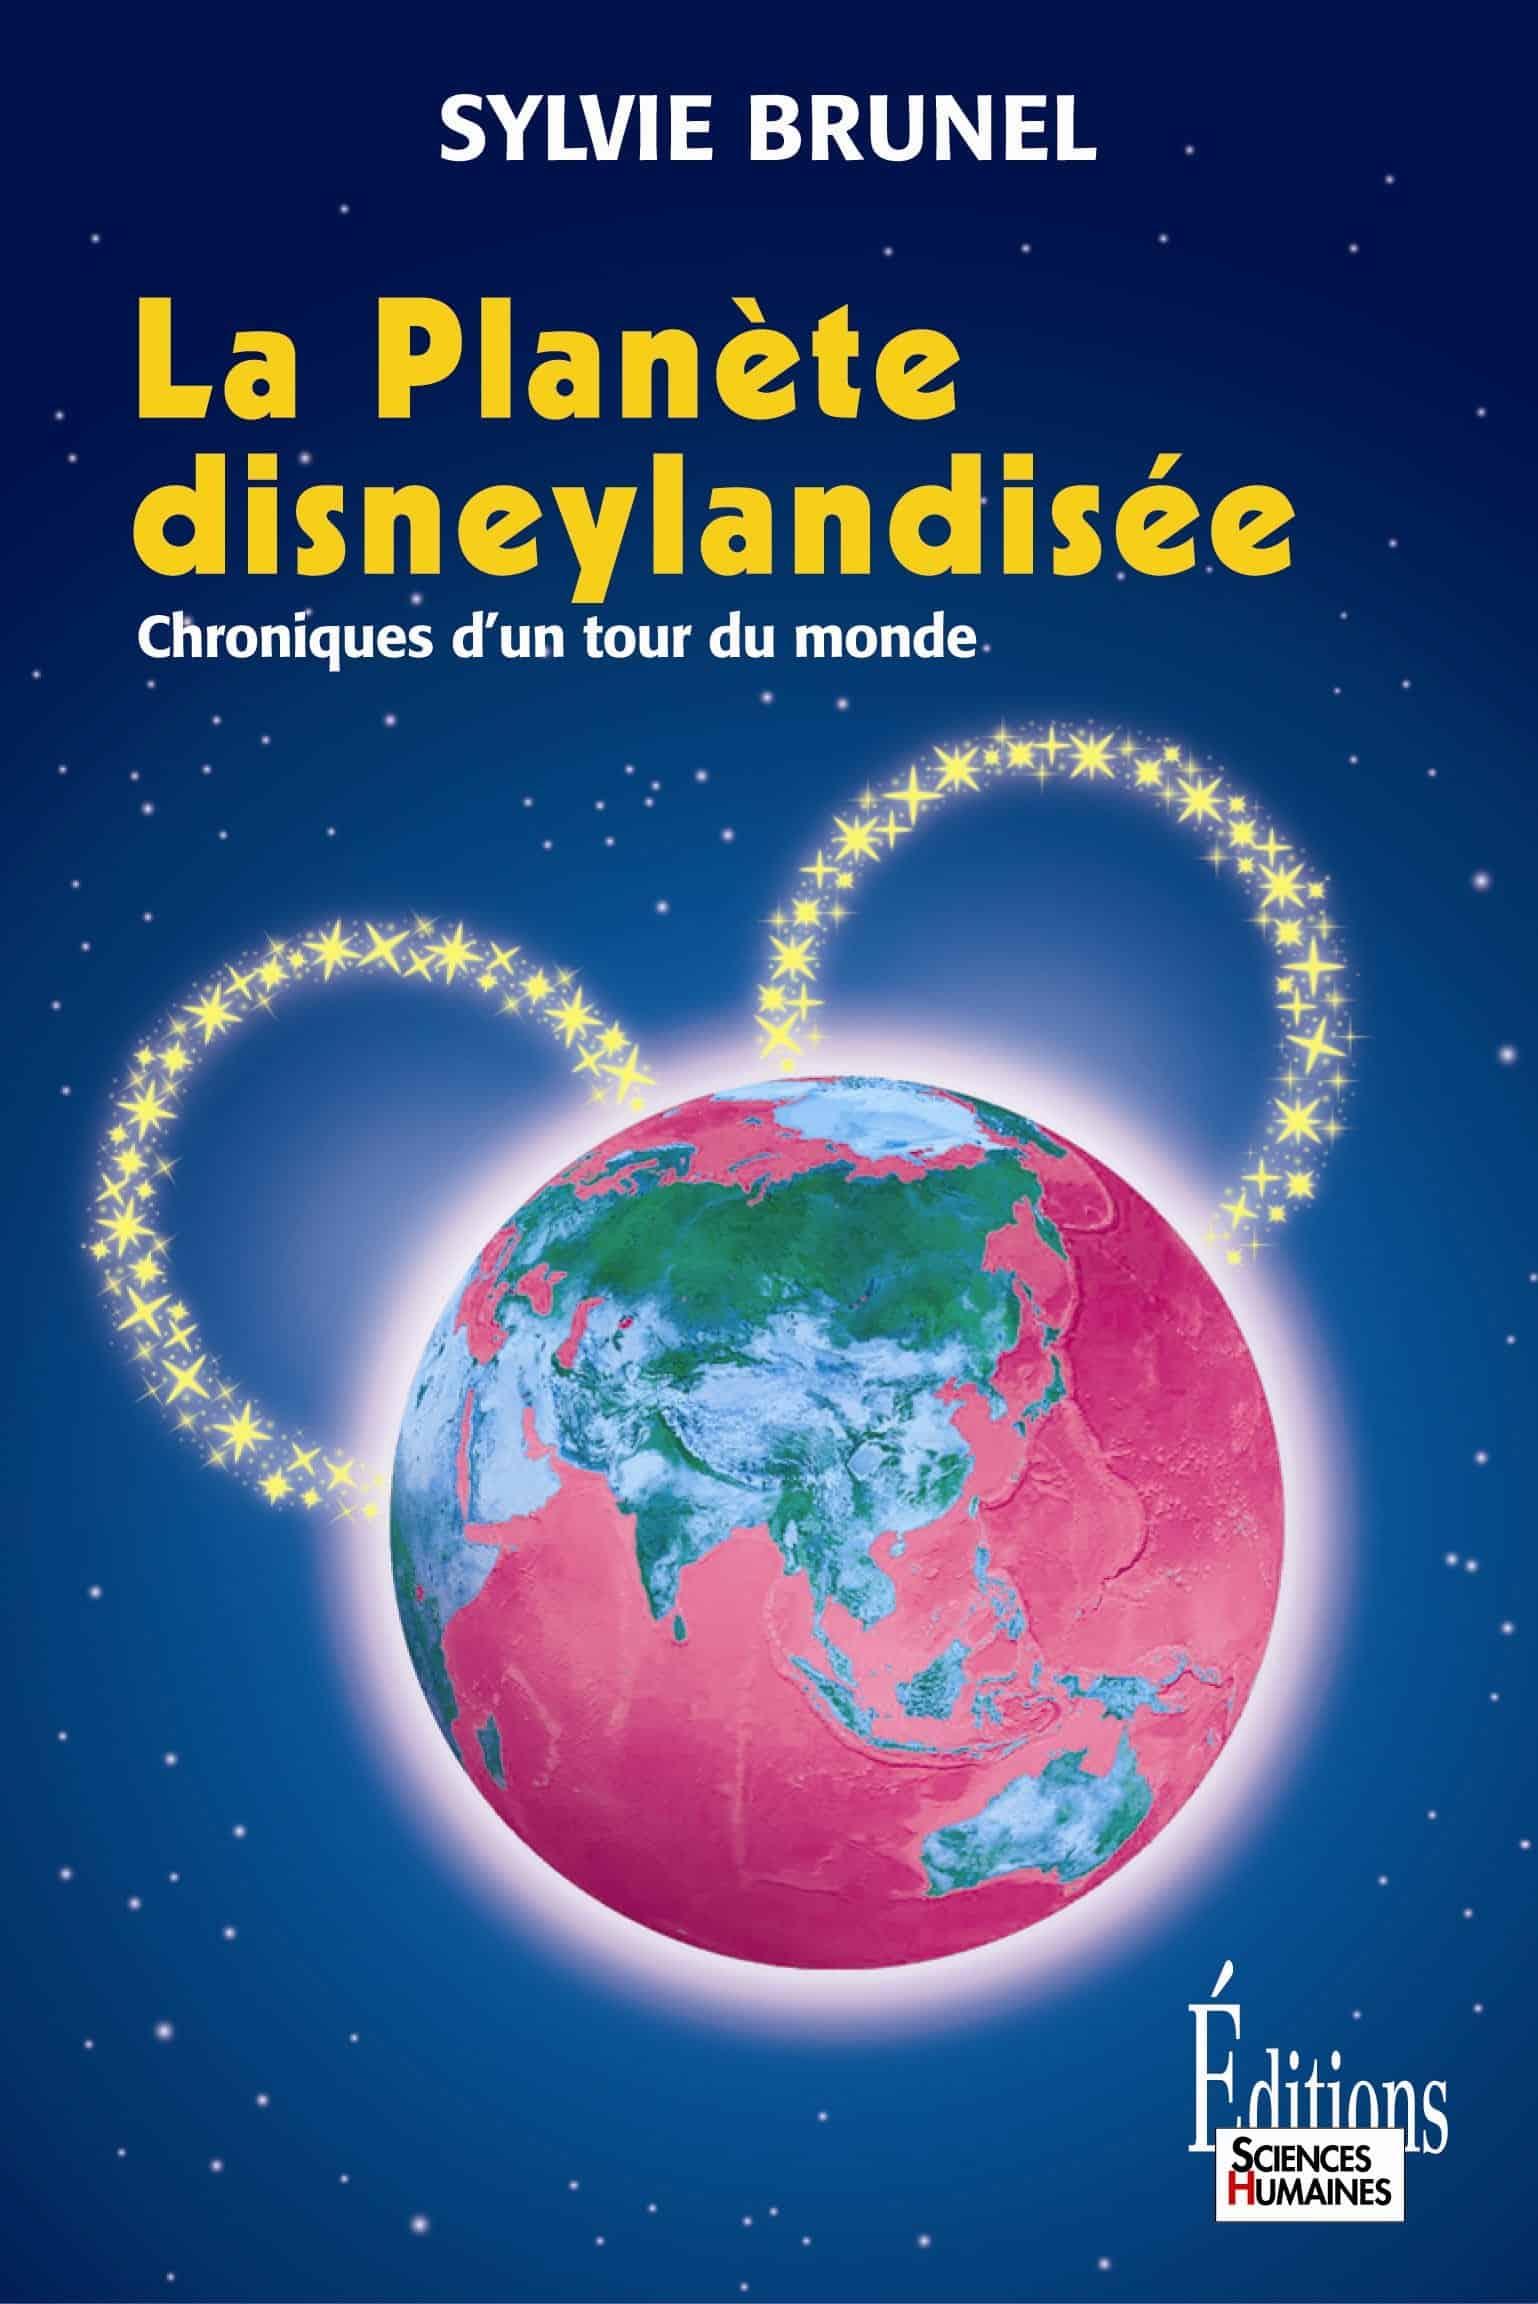 La-Planete-disneylandisee-par-Sylvie-Brunel